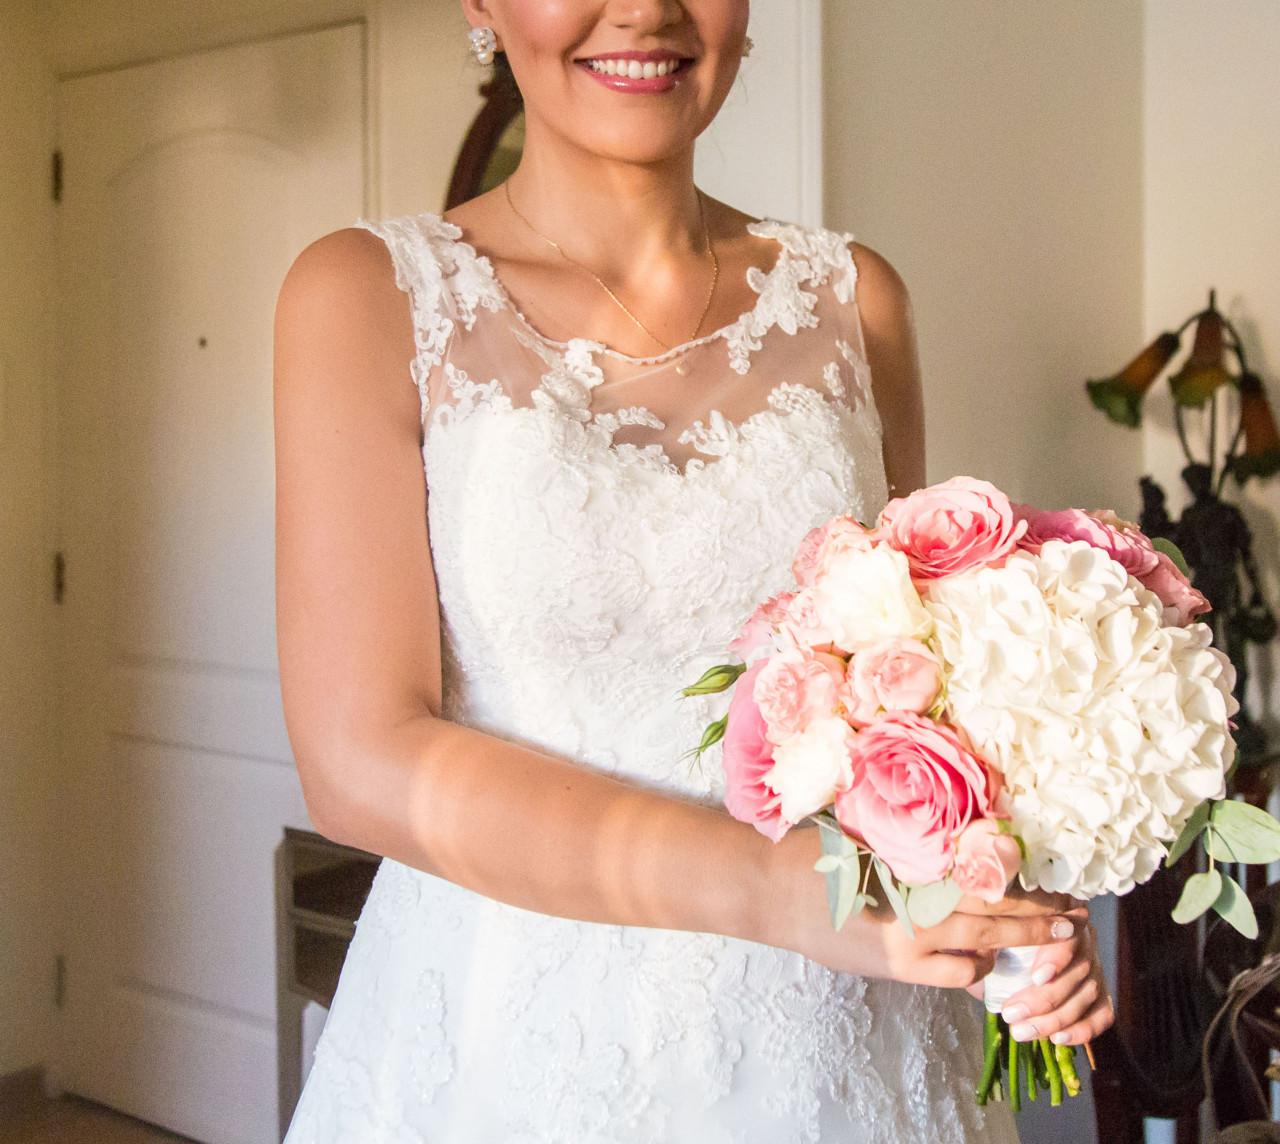 7dc5bd5e3 Catálogo de venta de vestidos de novia usados en Chile